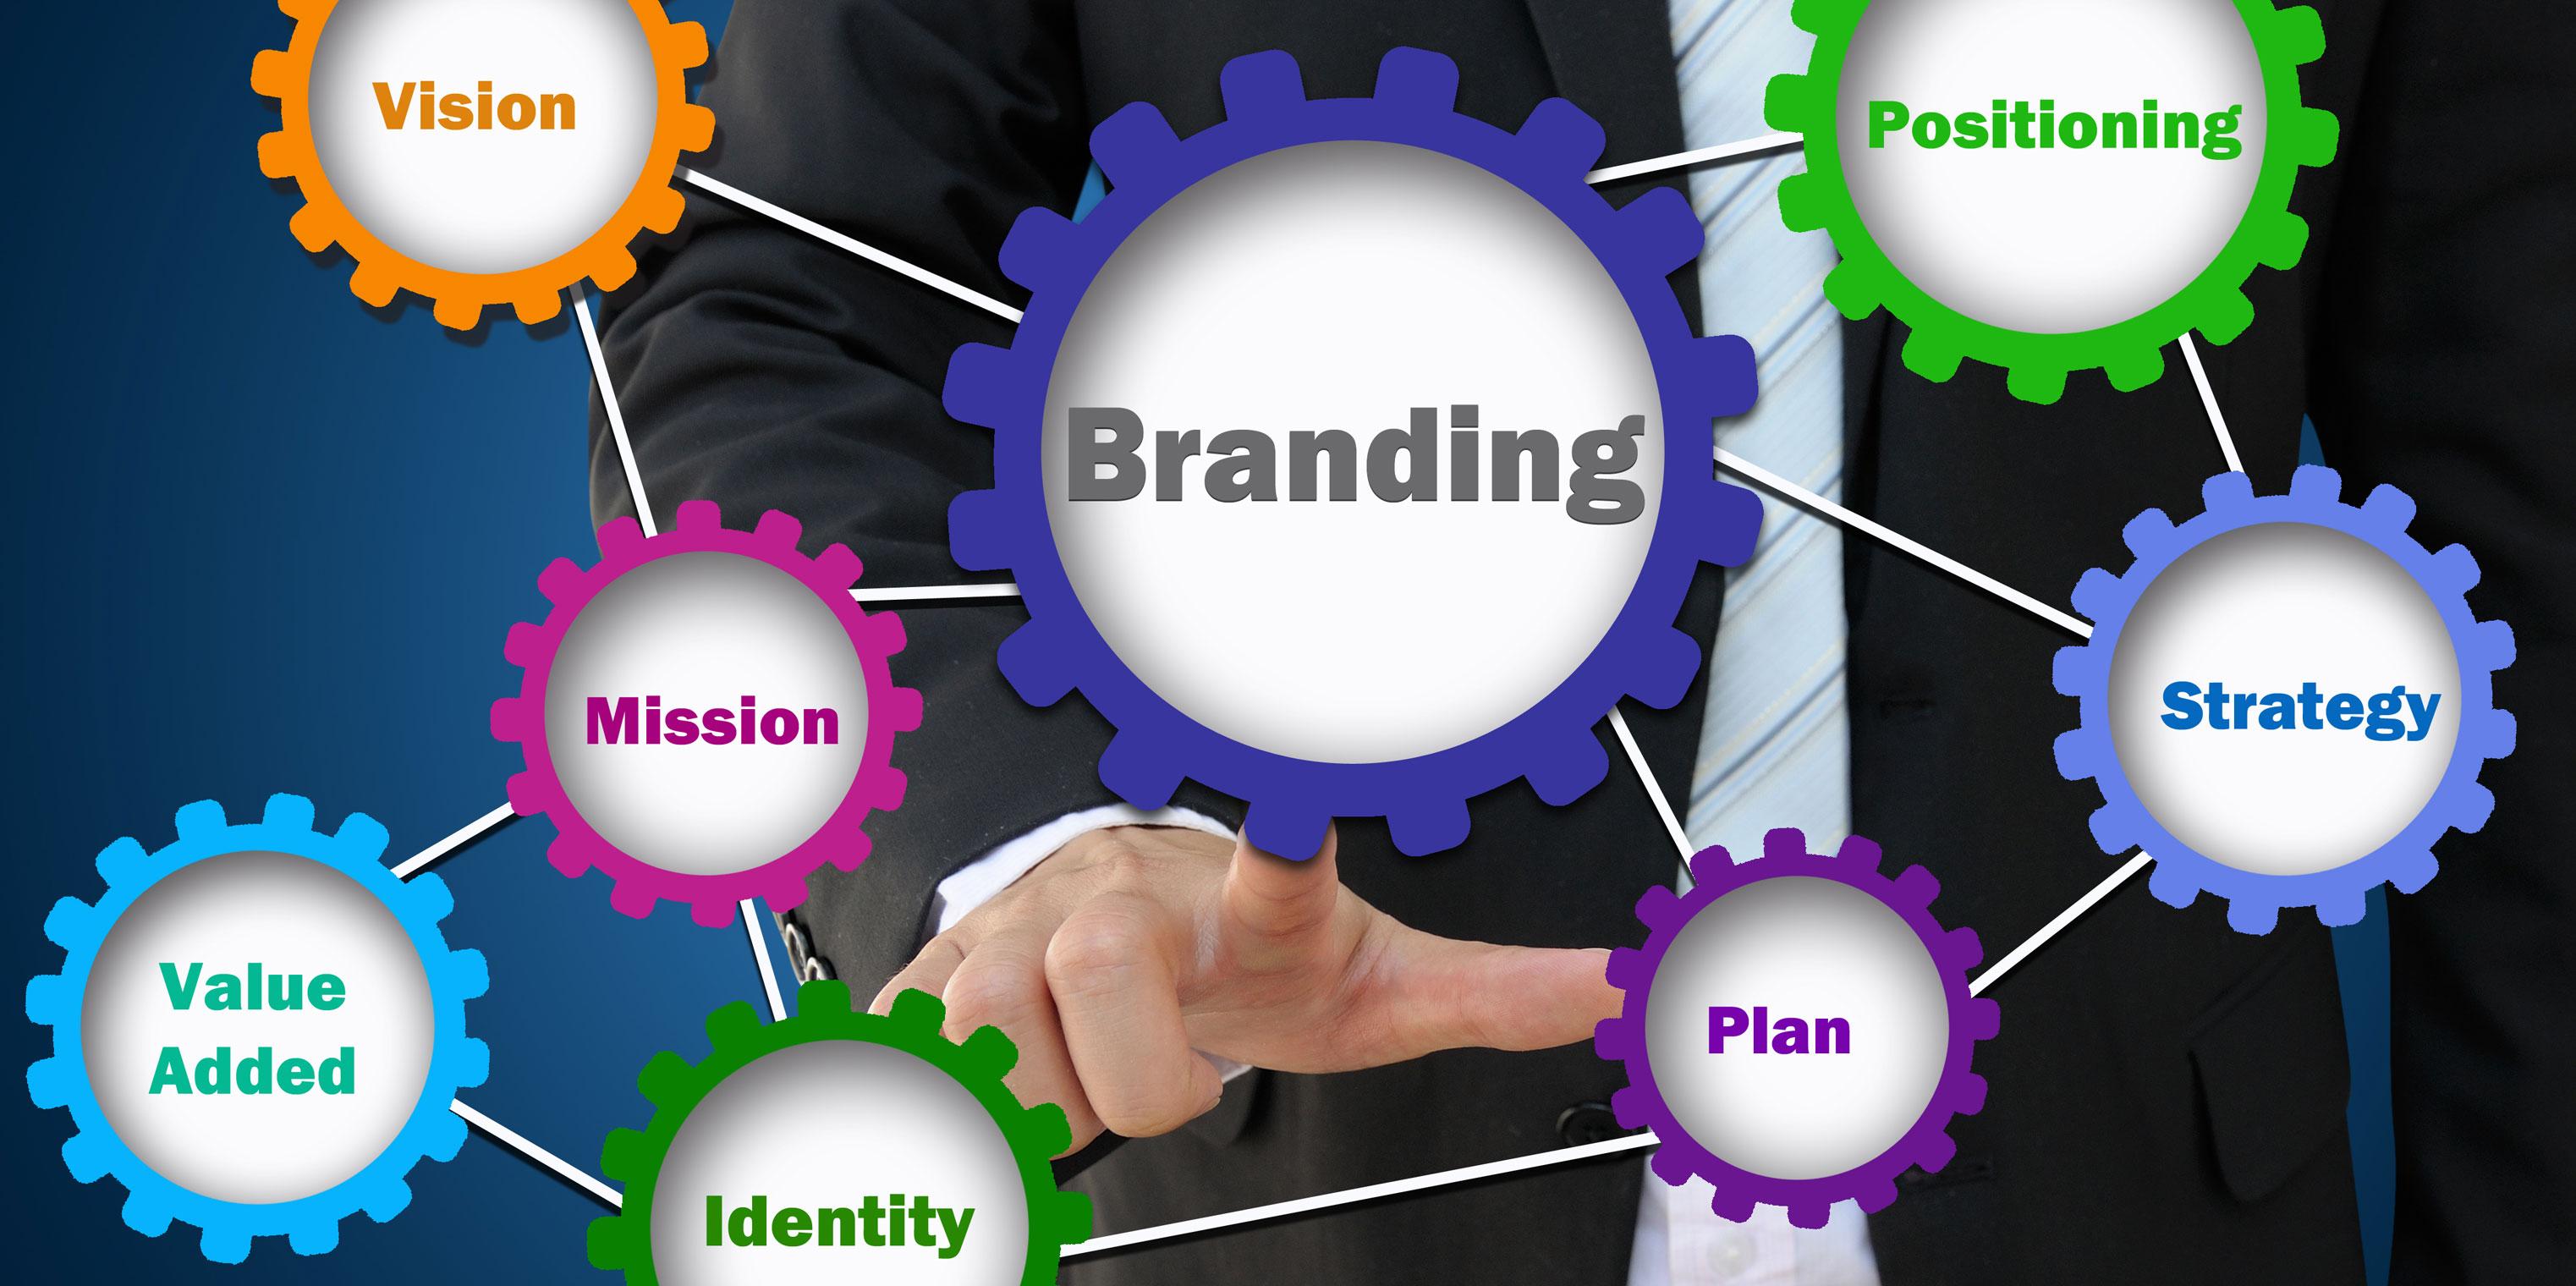 Varumärkesbyggande kommunikation